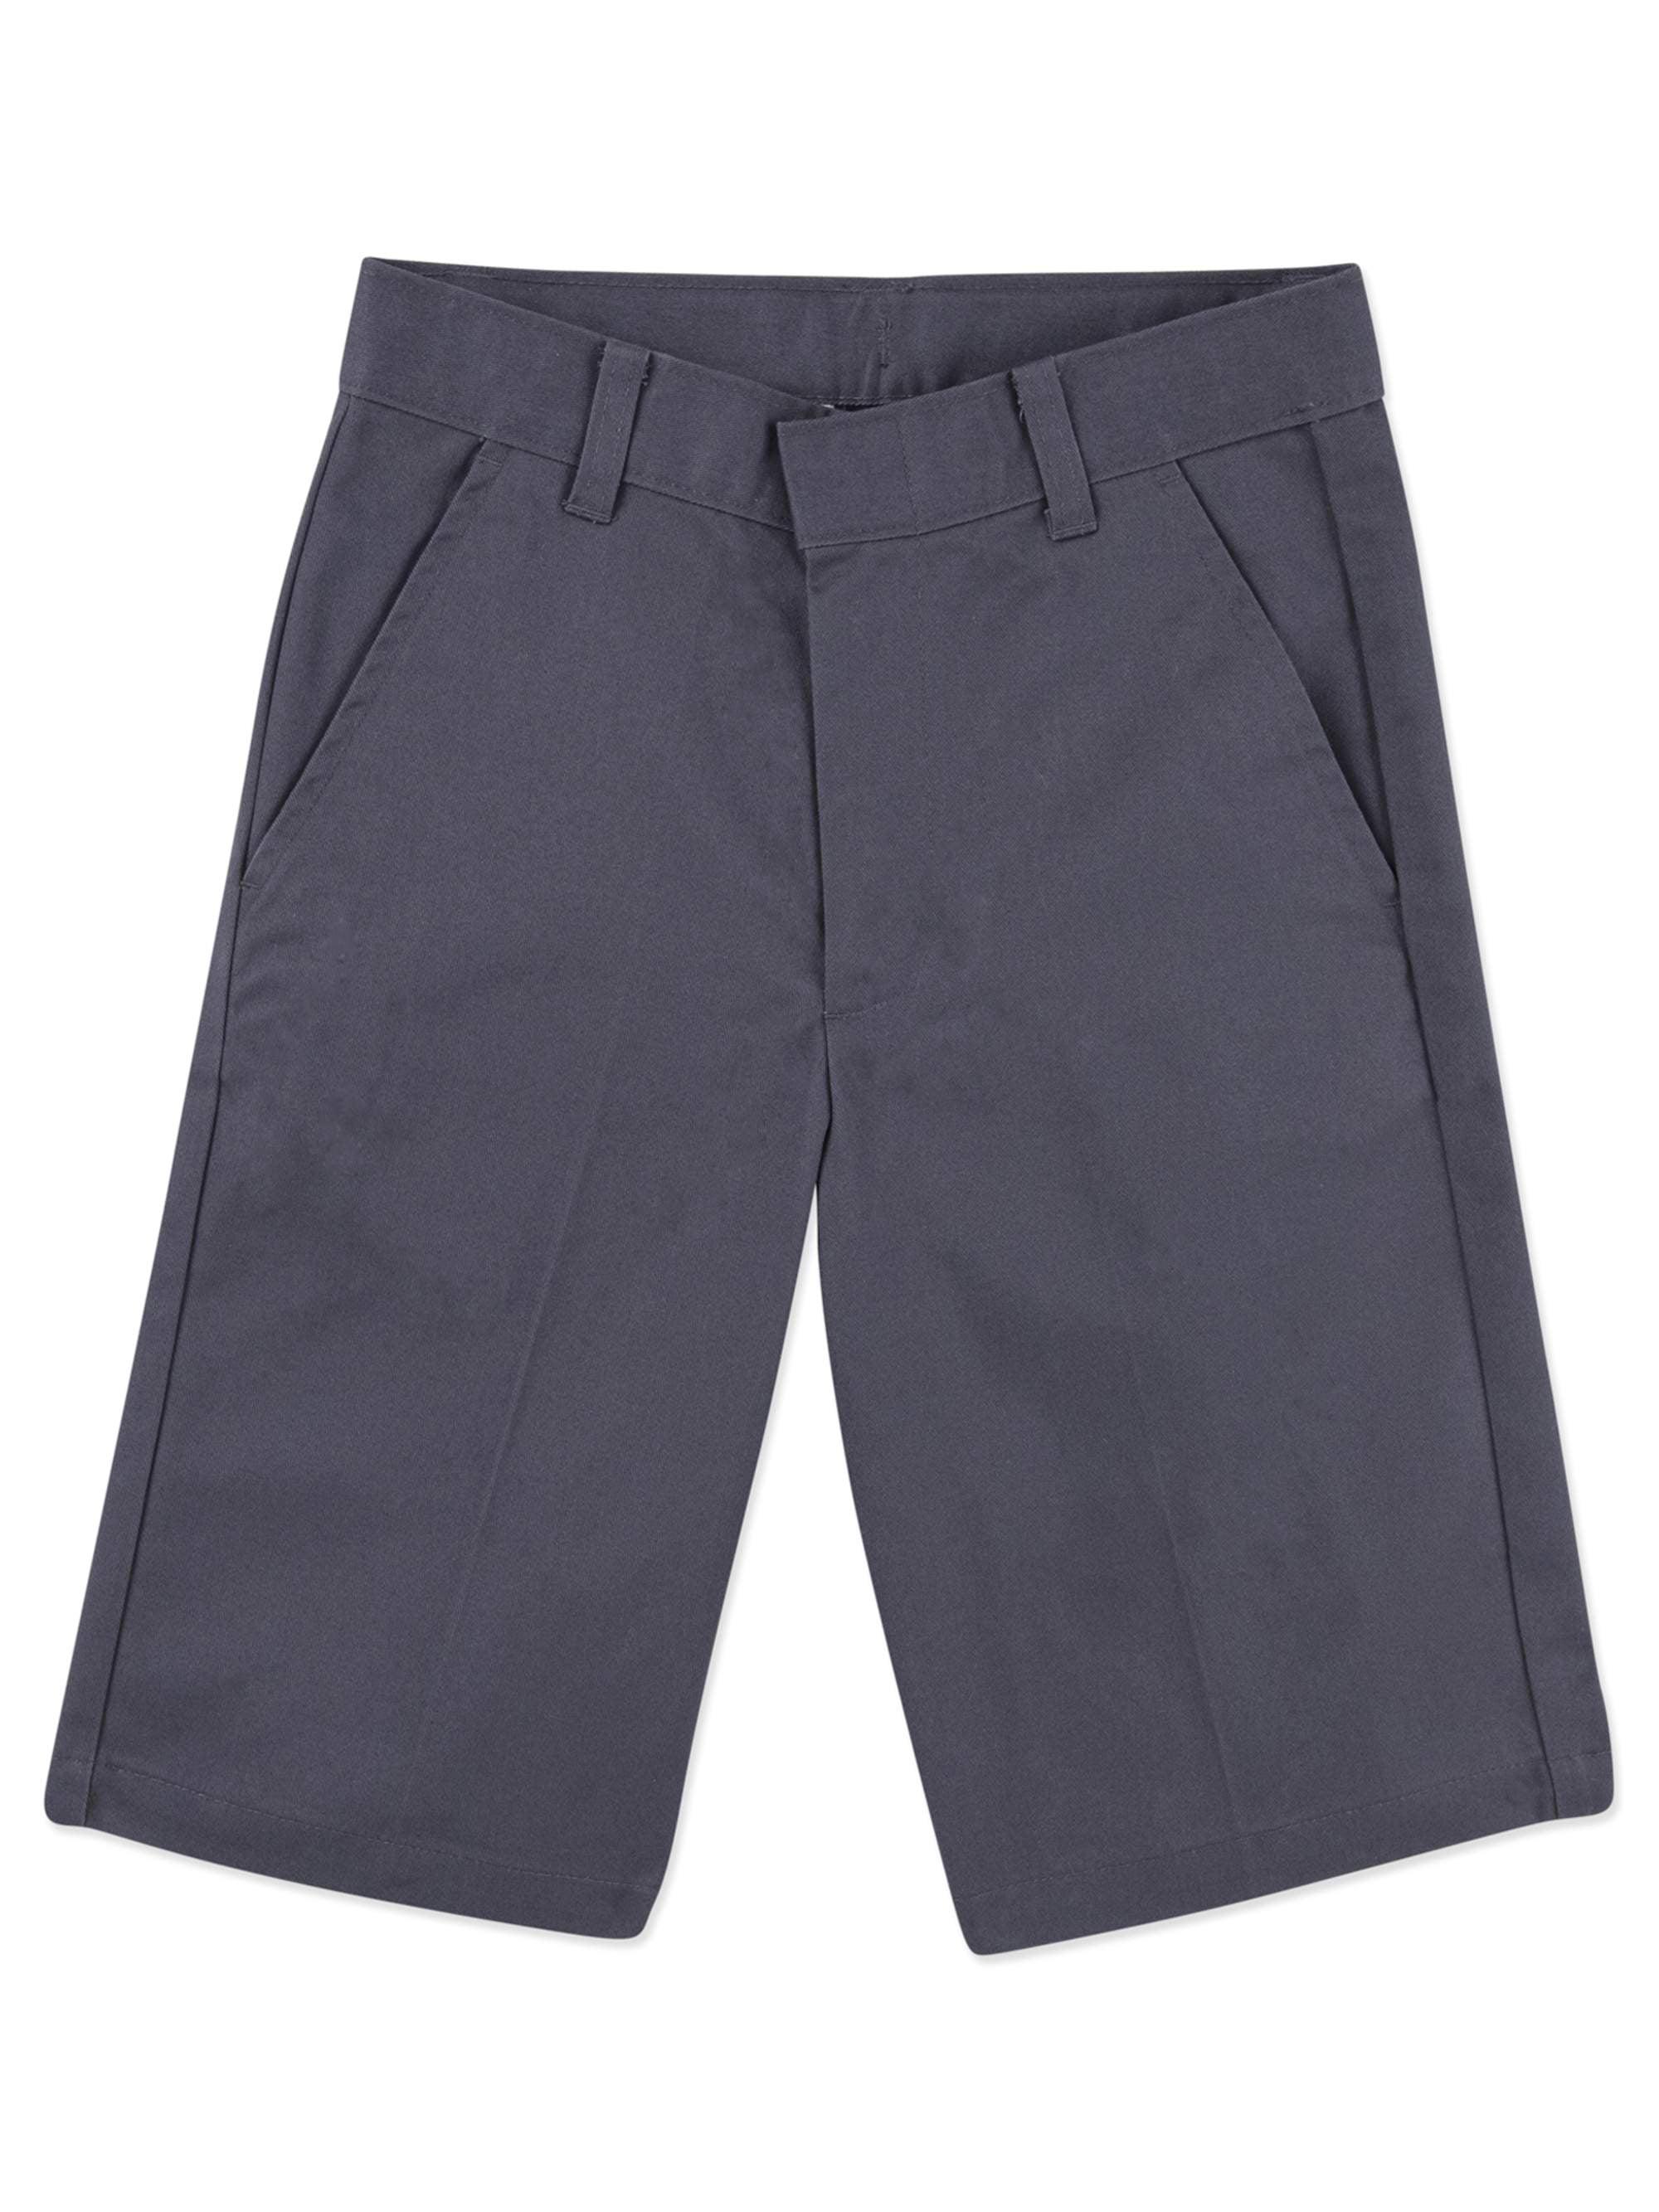 Boys School Uniforms Wrinkle Resistant Prep Flat Front Shorts Size 18-22